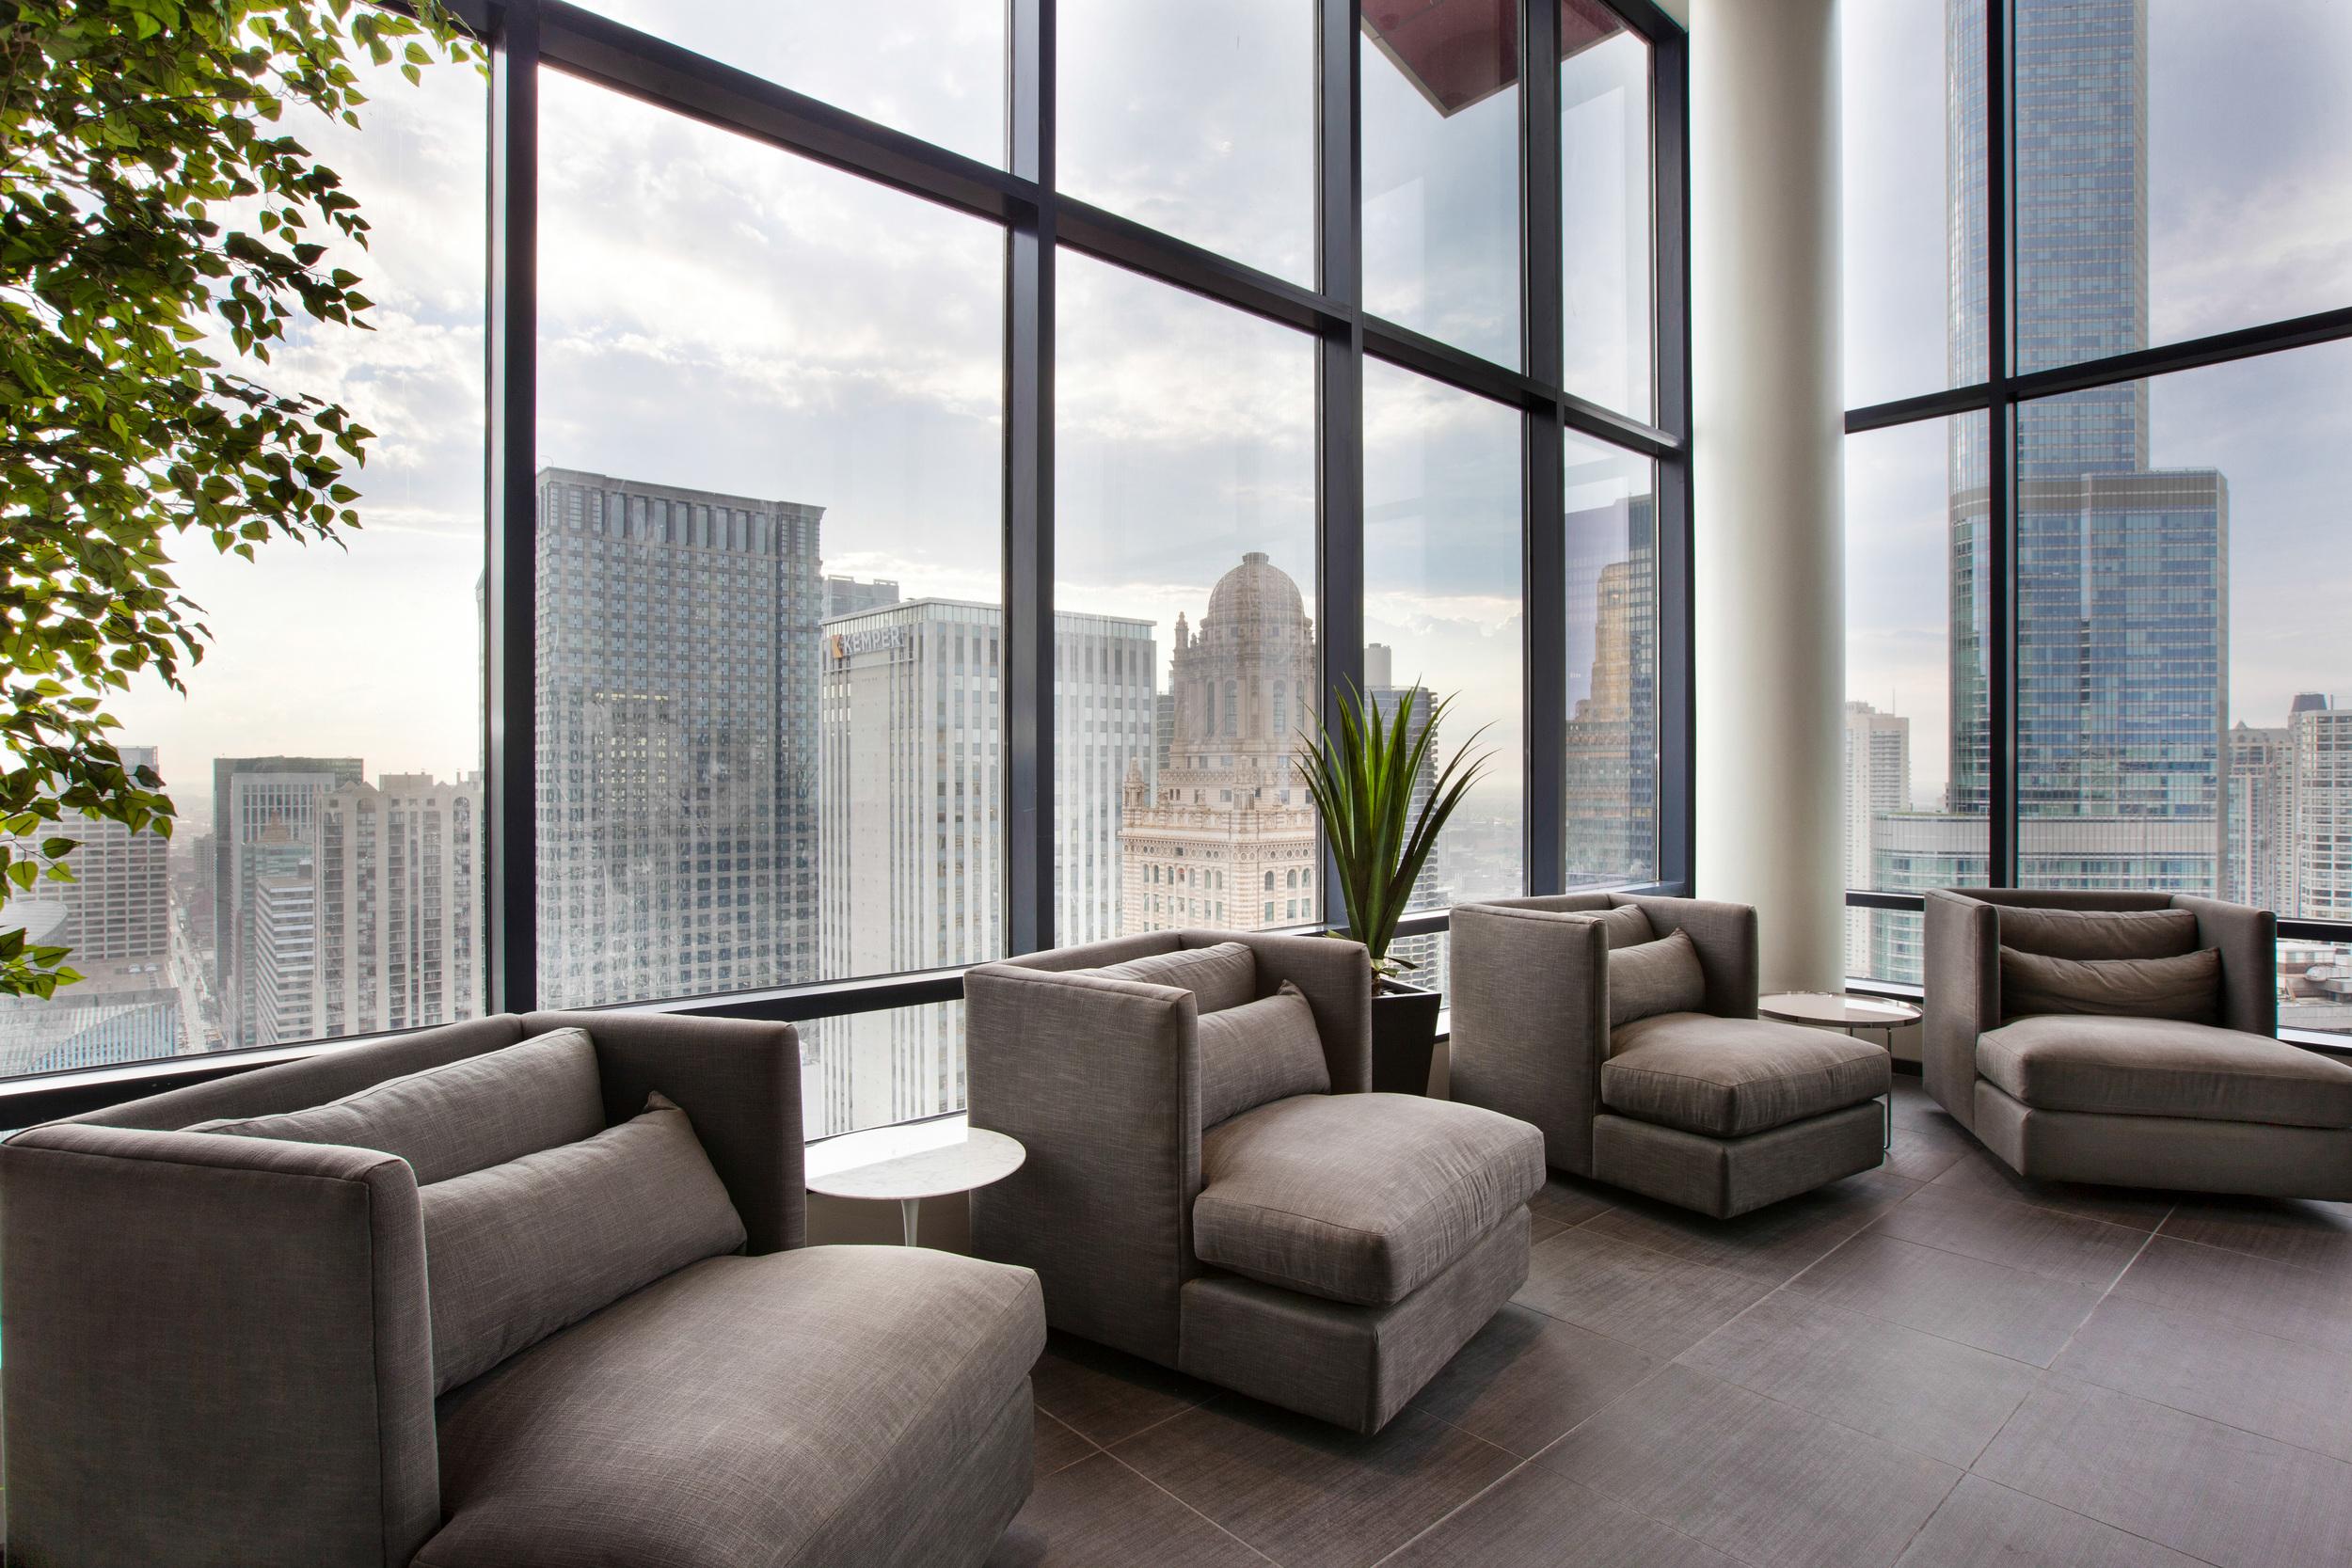 interior_photographer_chicago.jpg